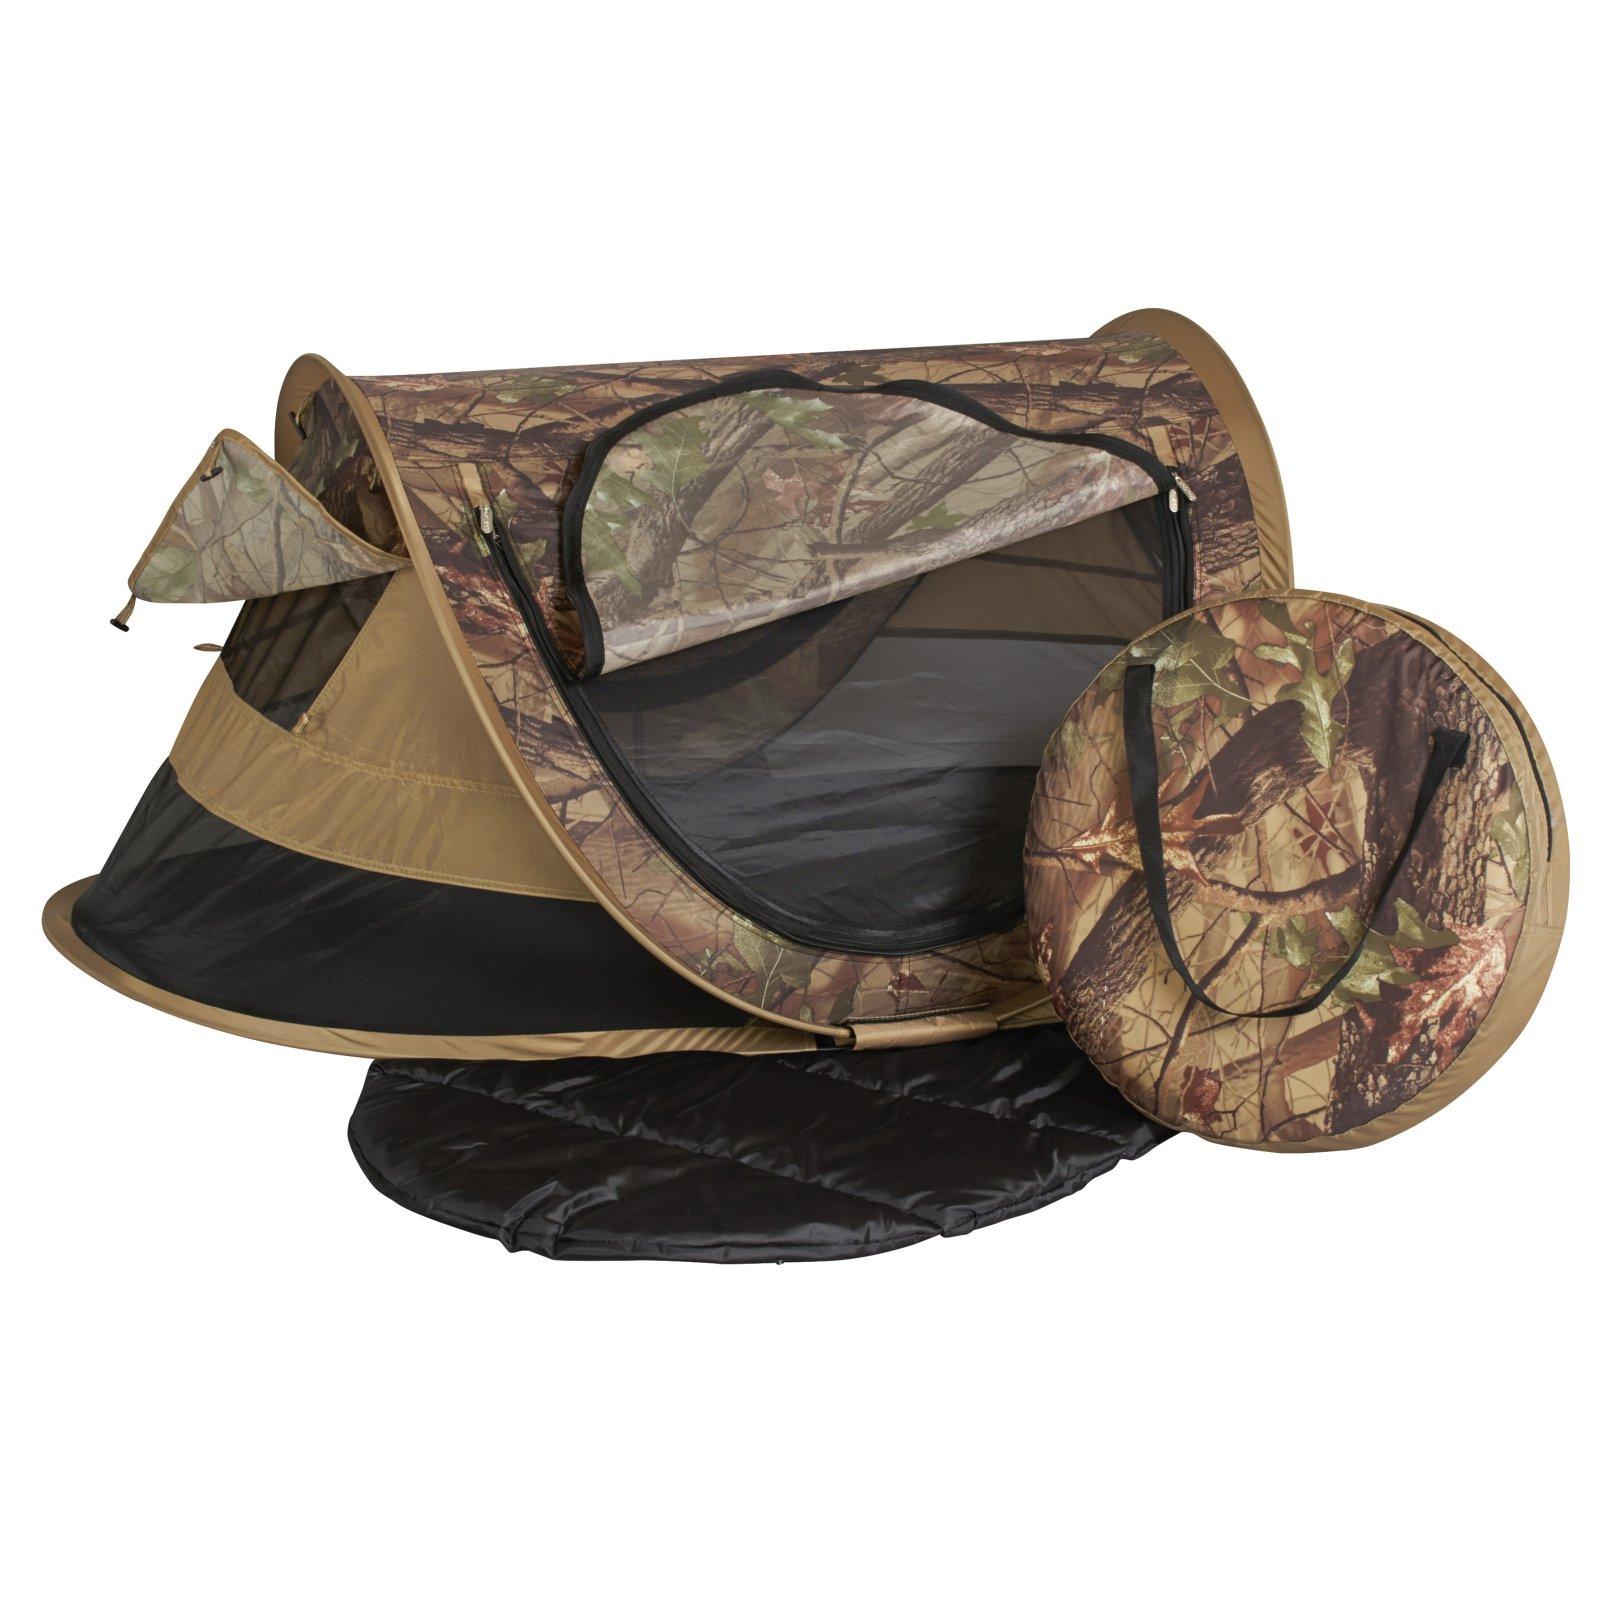 Kidco Peapod Plus Portable Travel Bed Camo Walmart Com